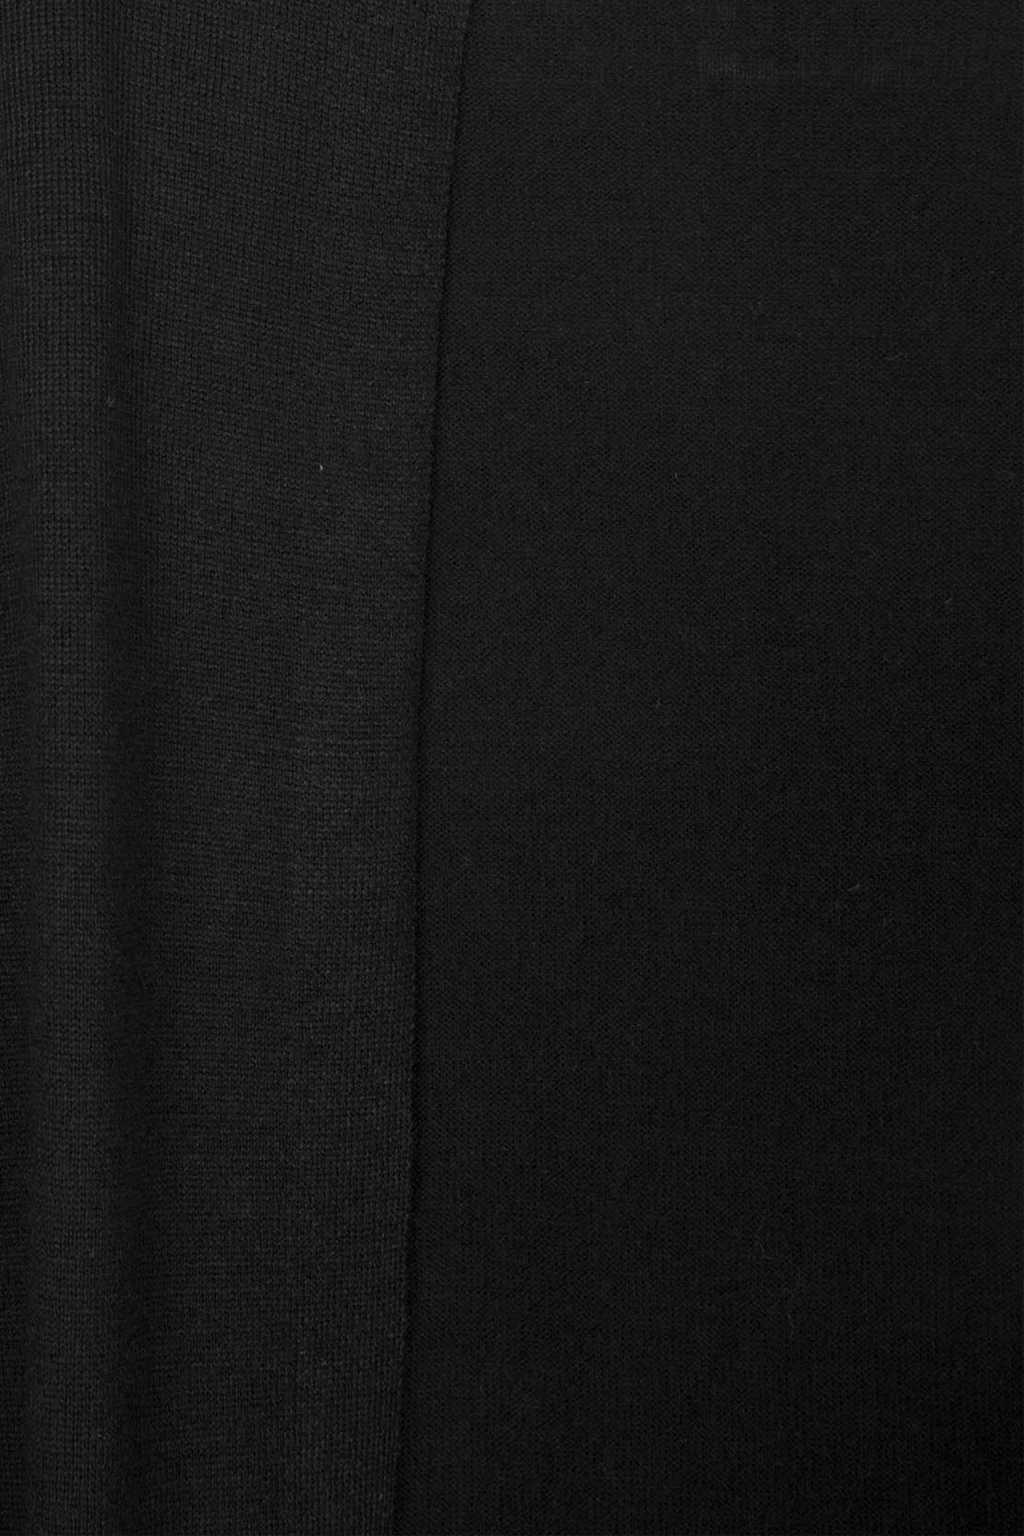 Cardigan 1406 Black 11